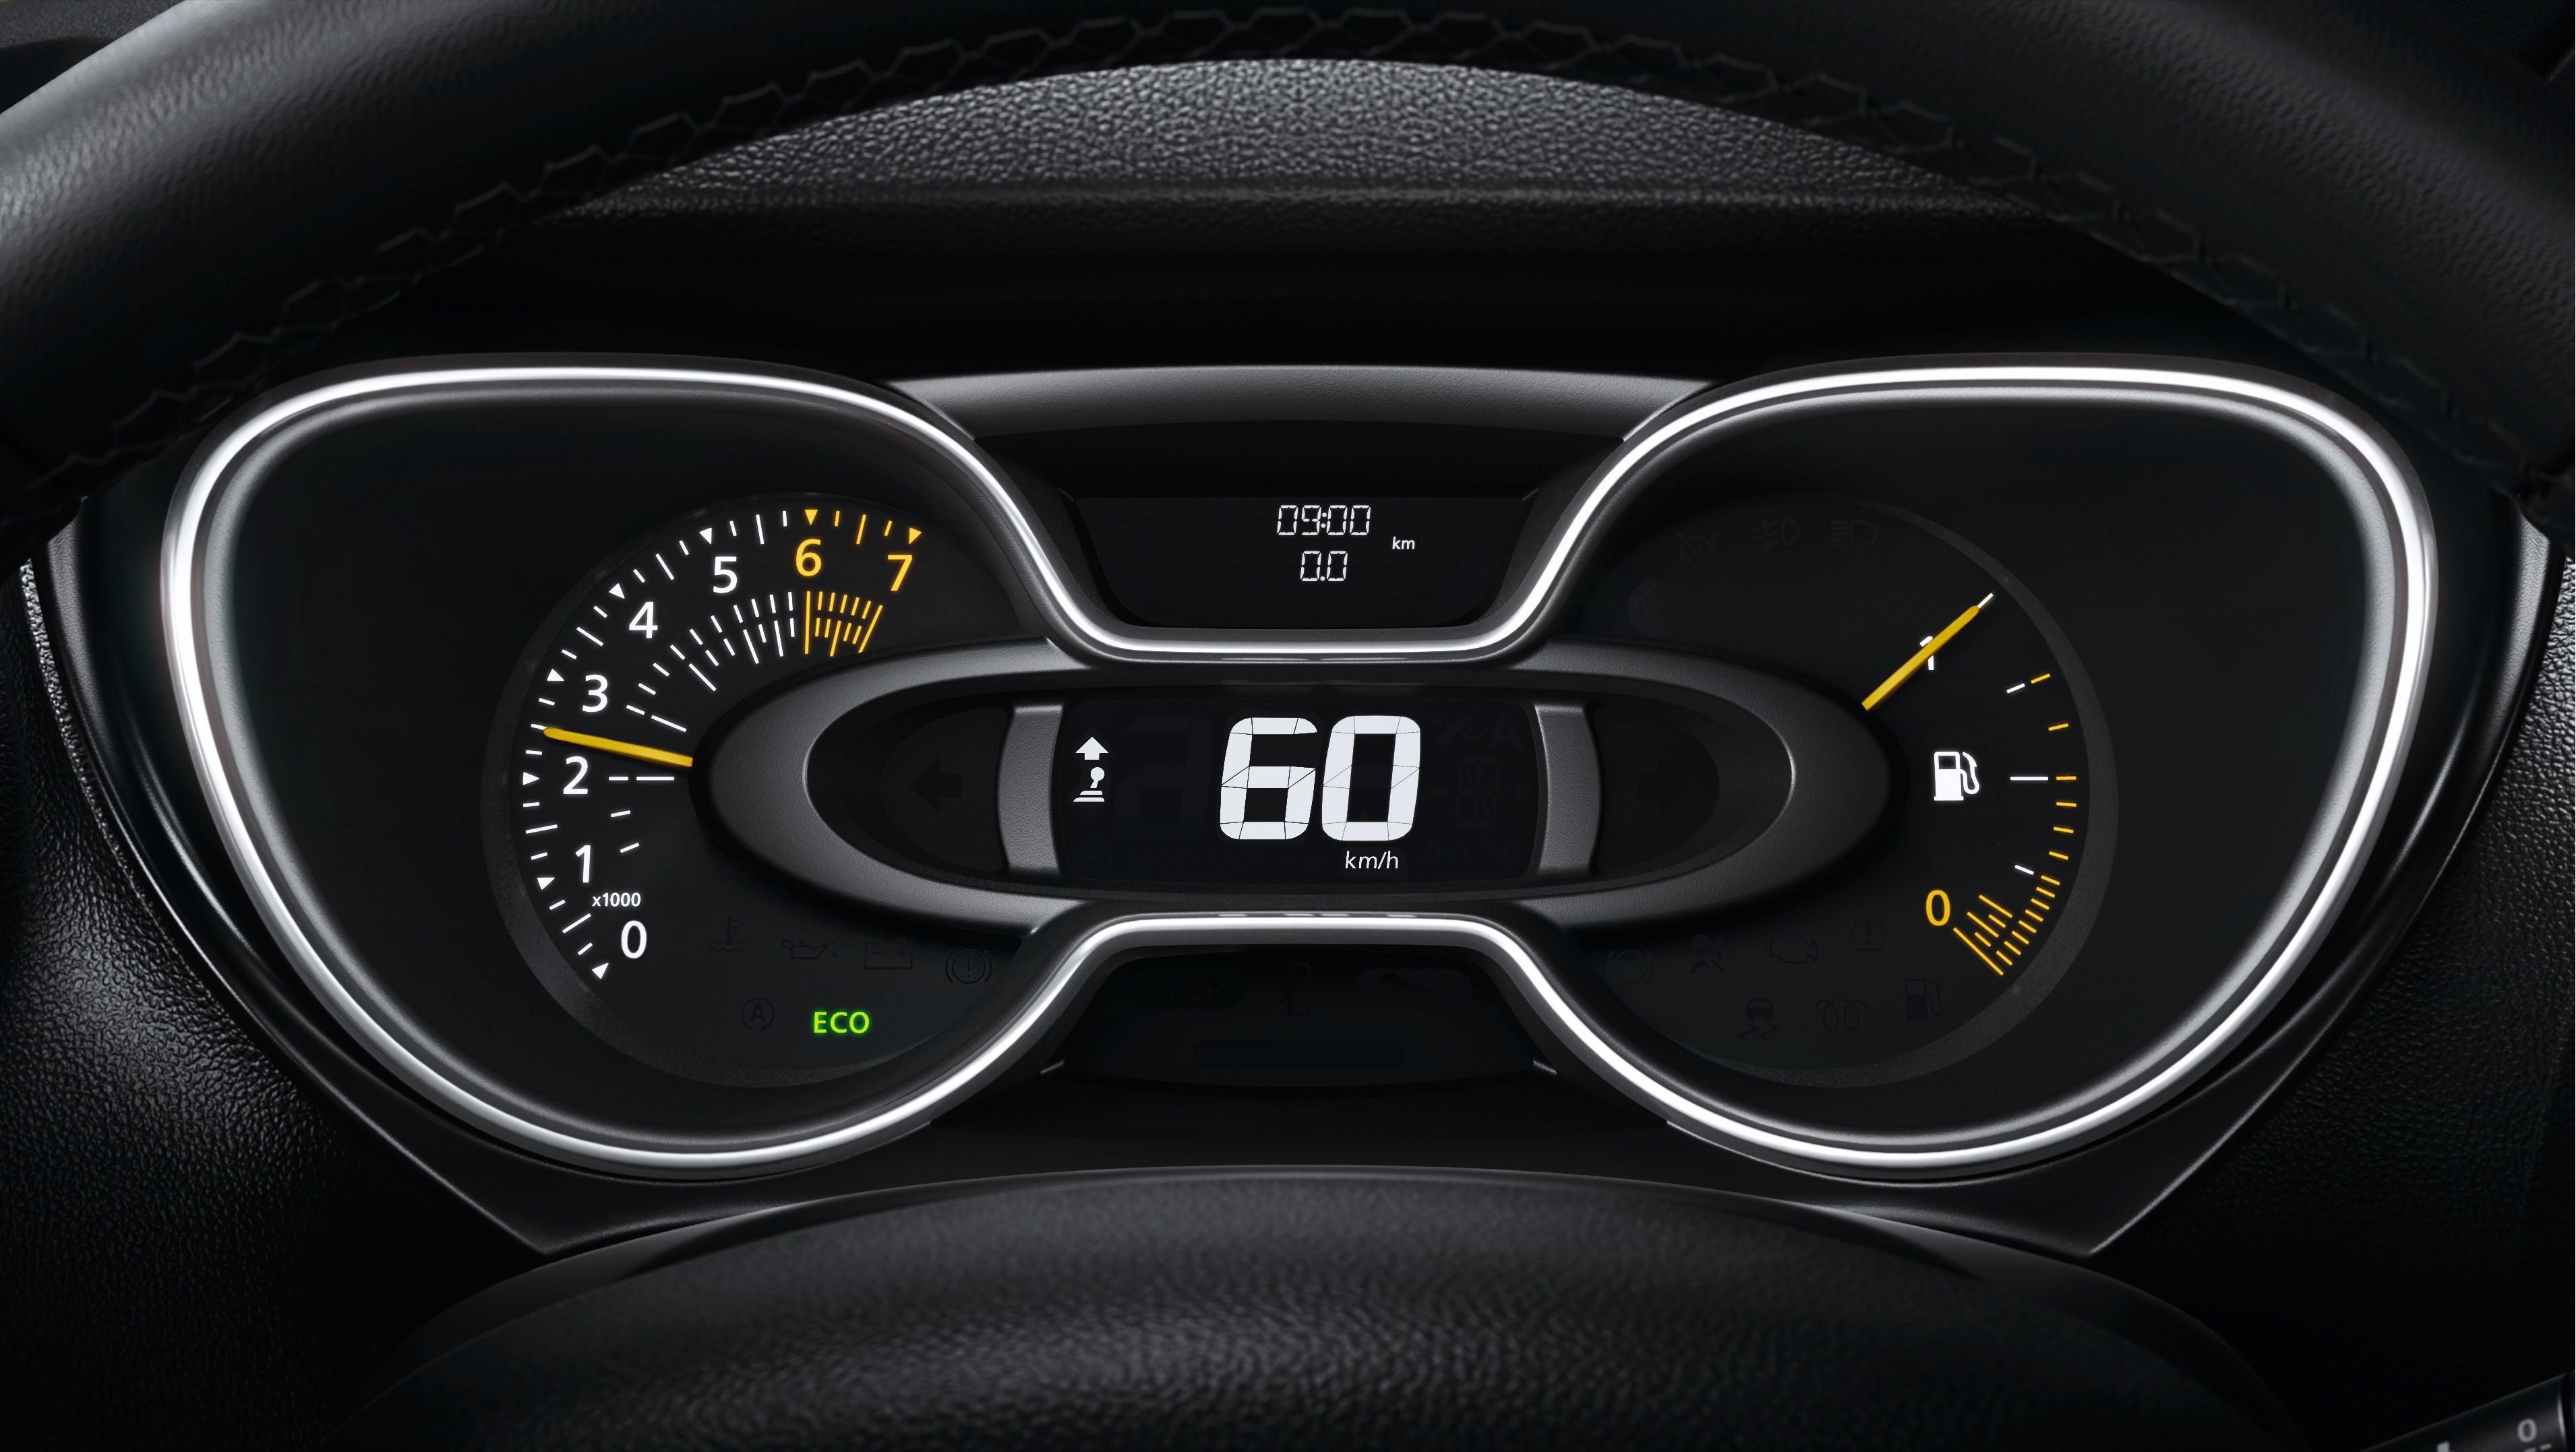 Renault Kaptur images (3)